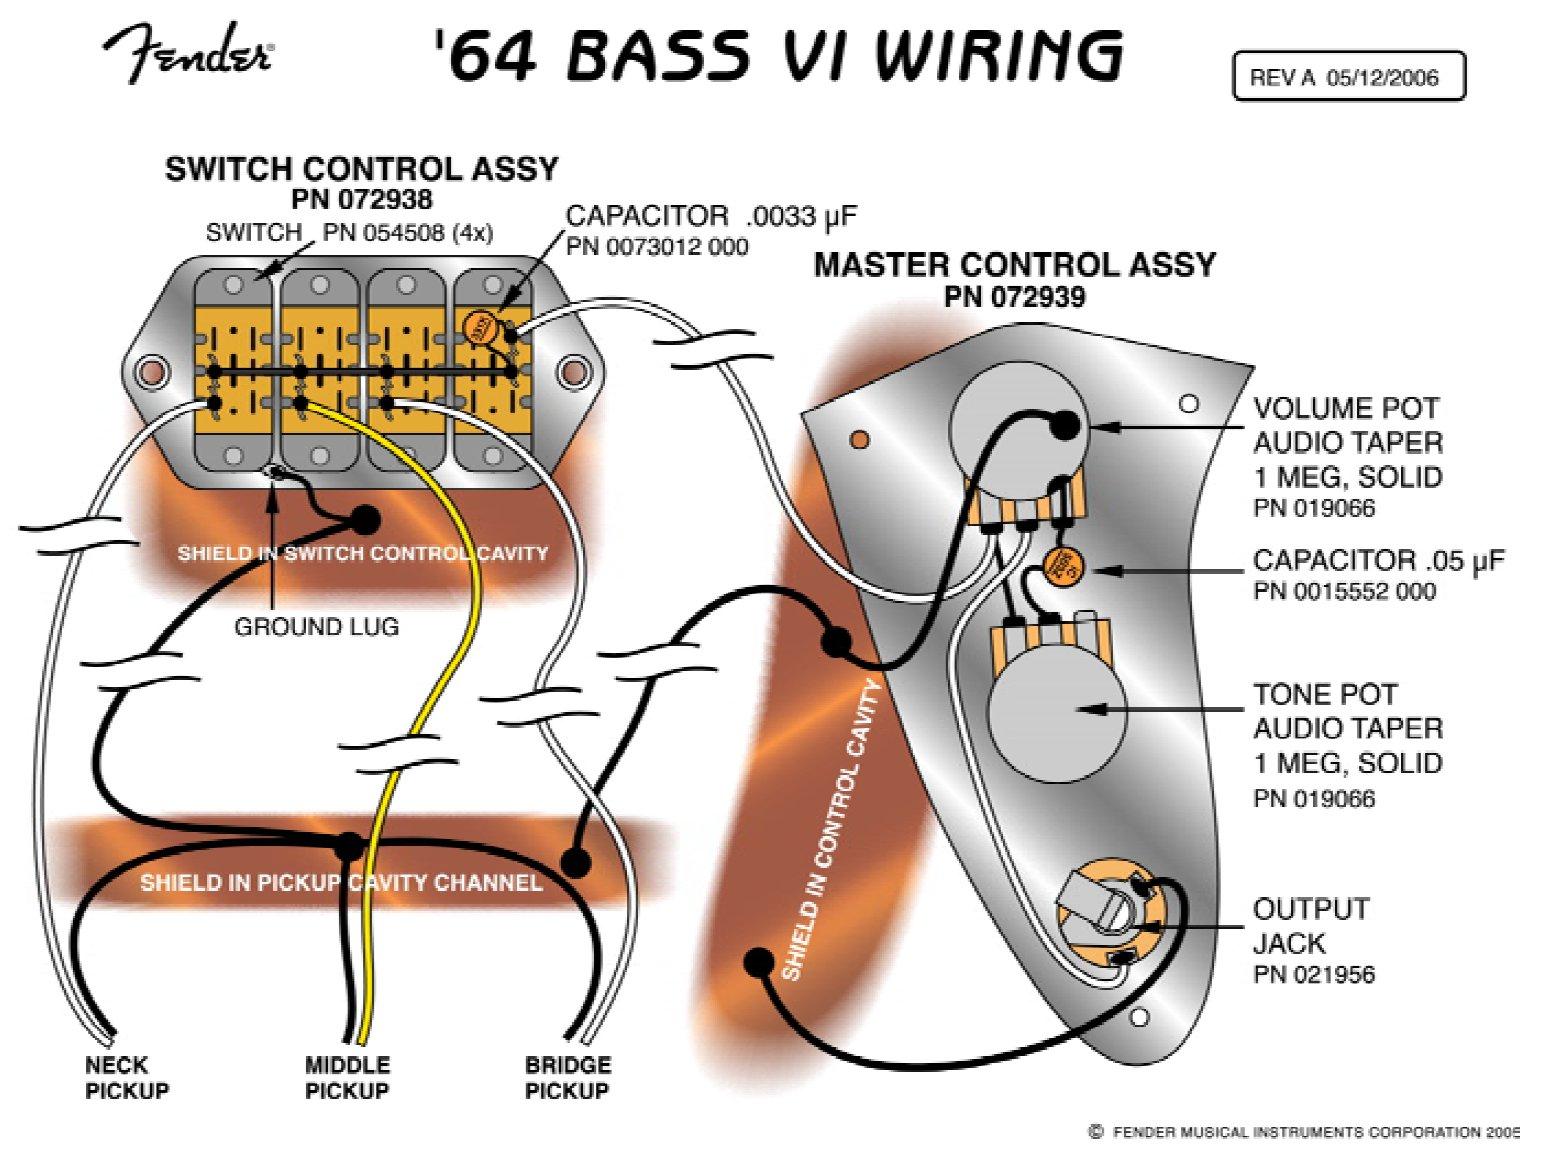 Berühmt Fender Mustang Schaltplan Galerie - Die Besten Elektrischen ...